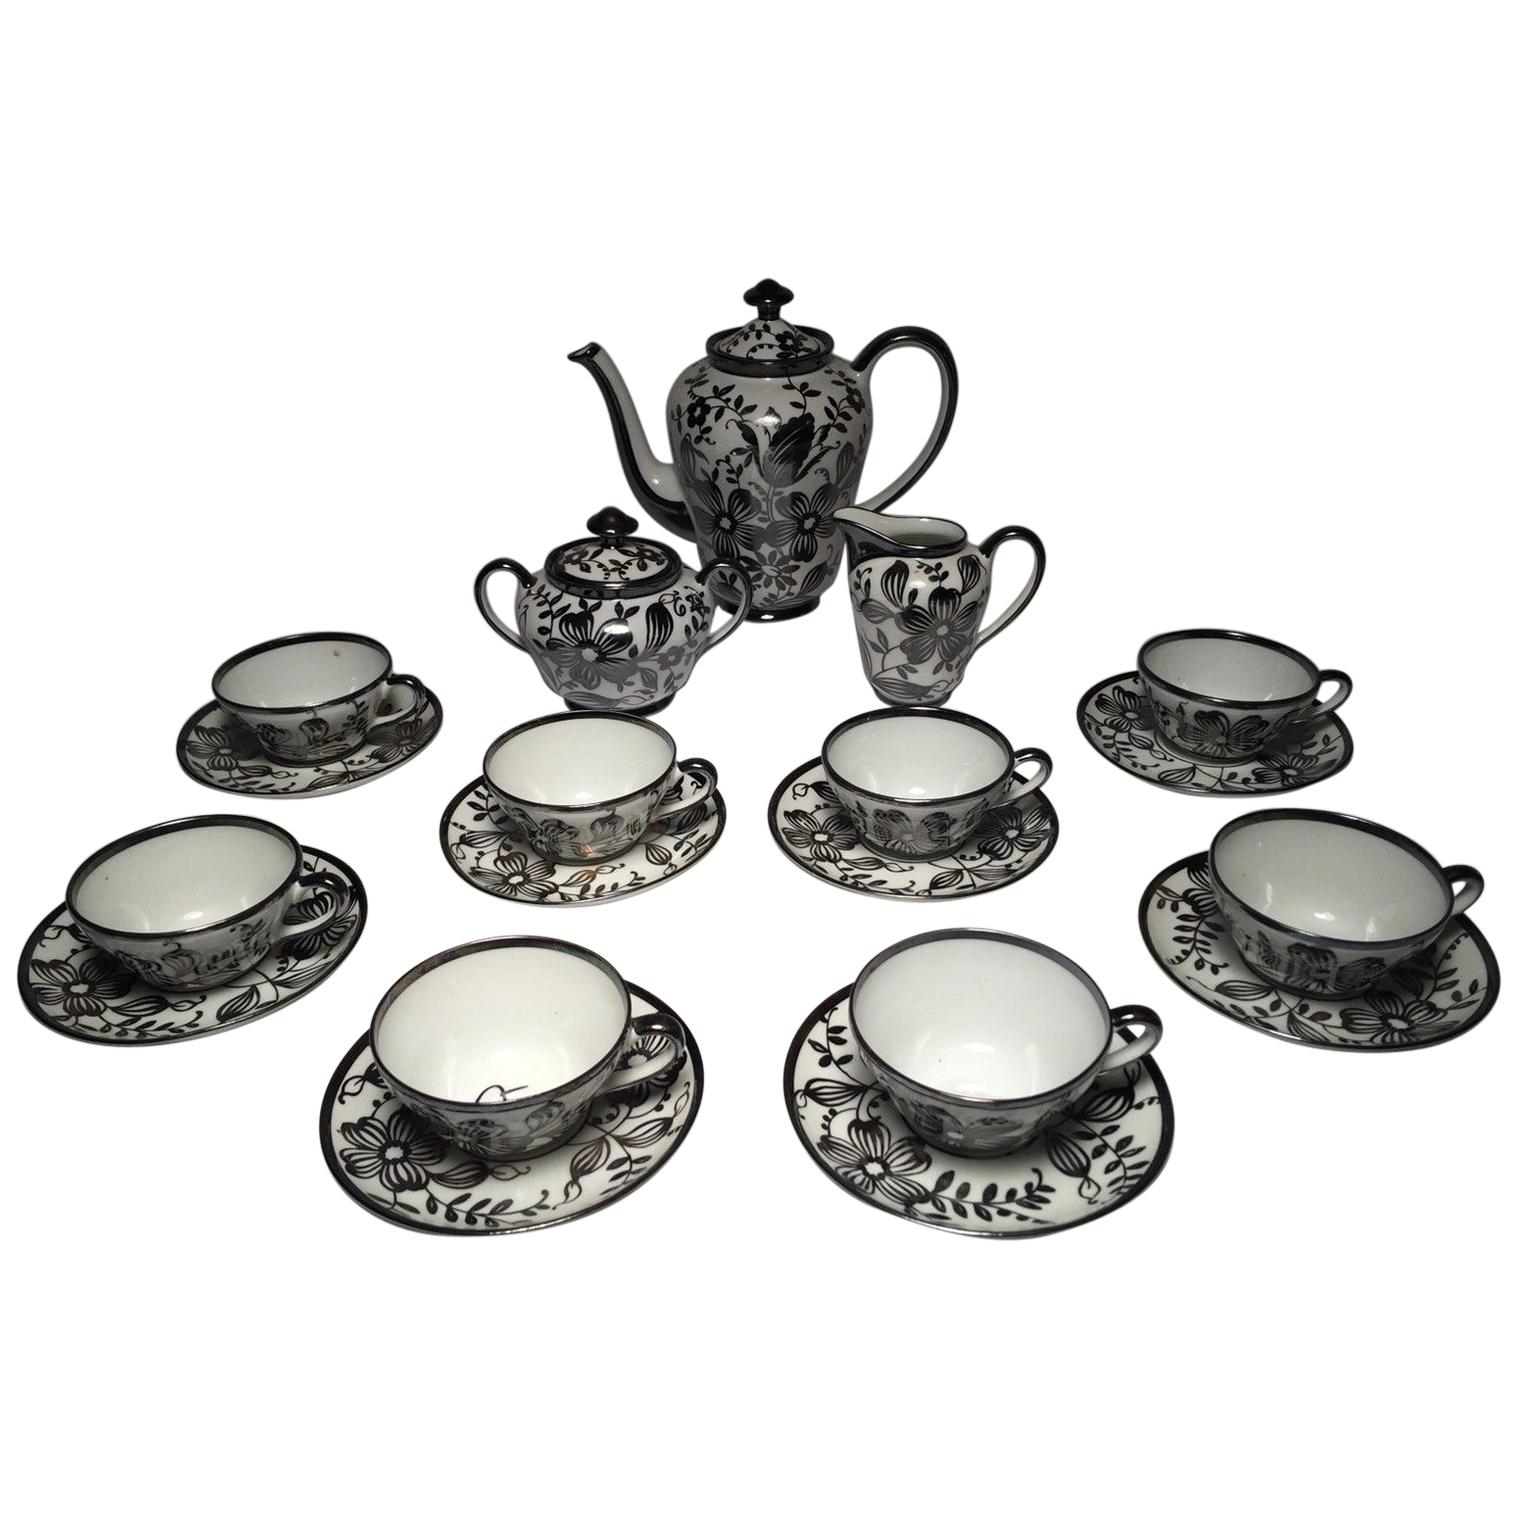 Vintage Midcentury Bavarian Porcelain Tea Set